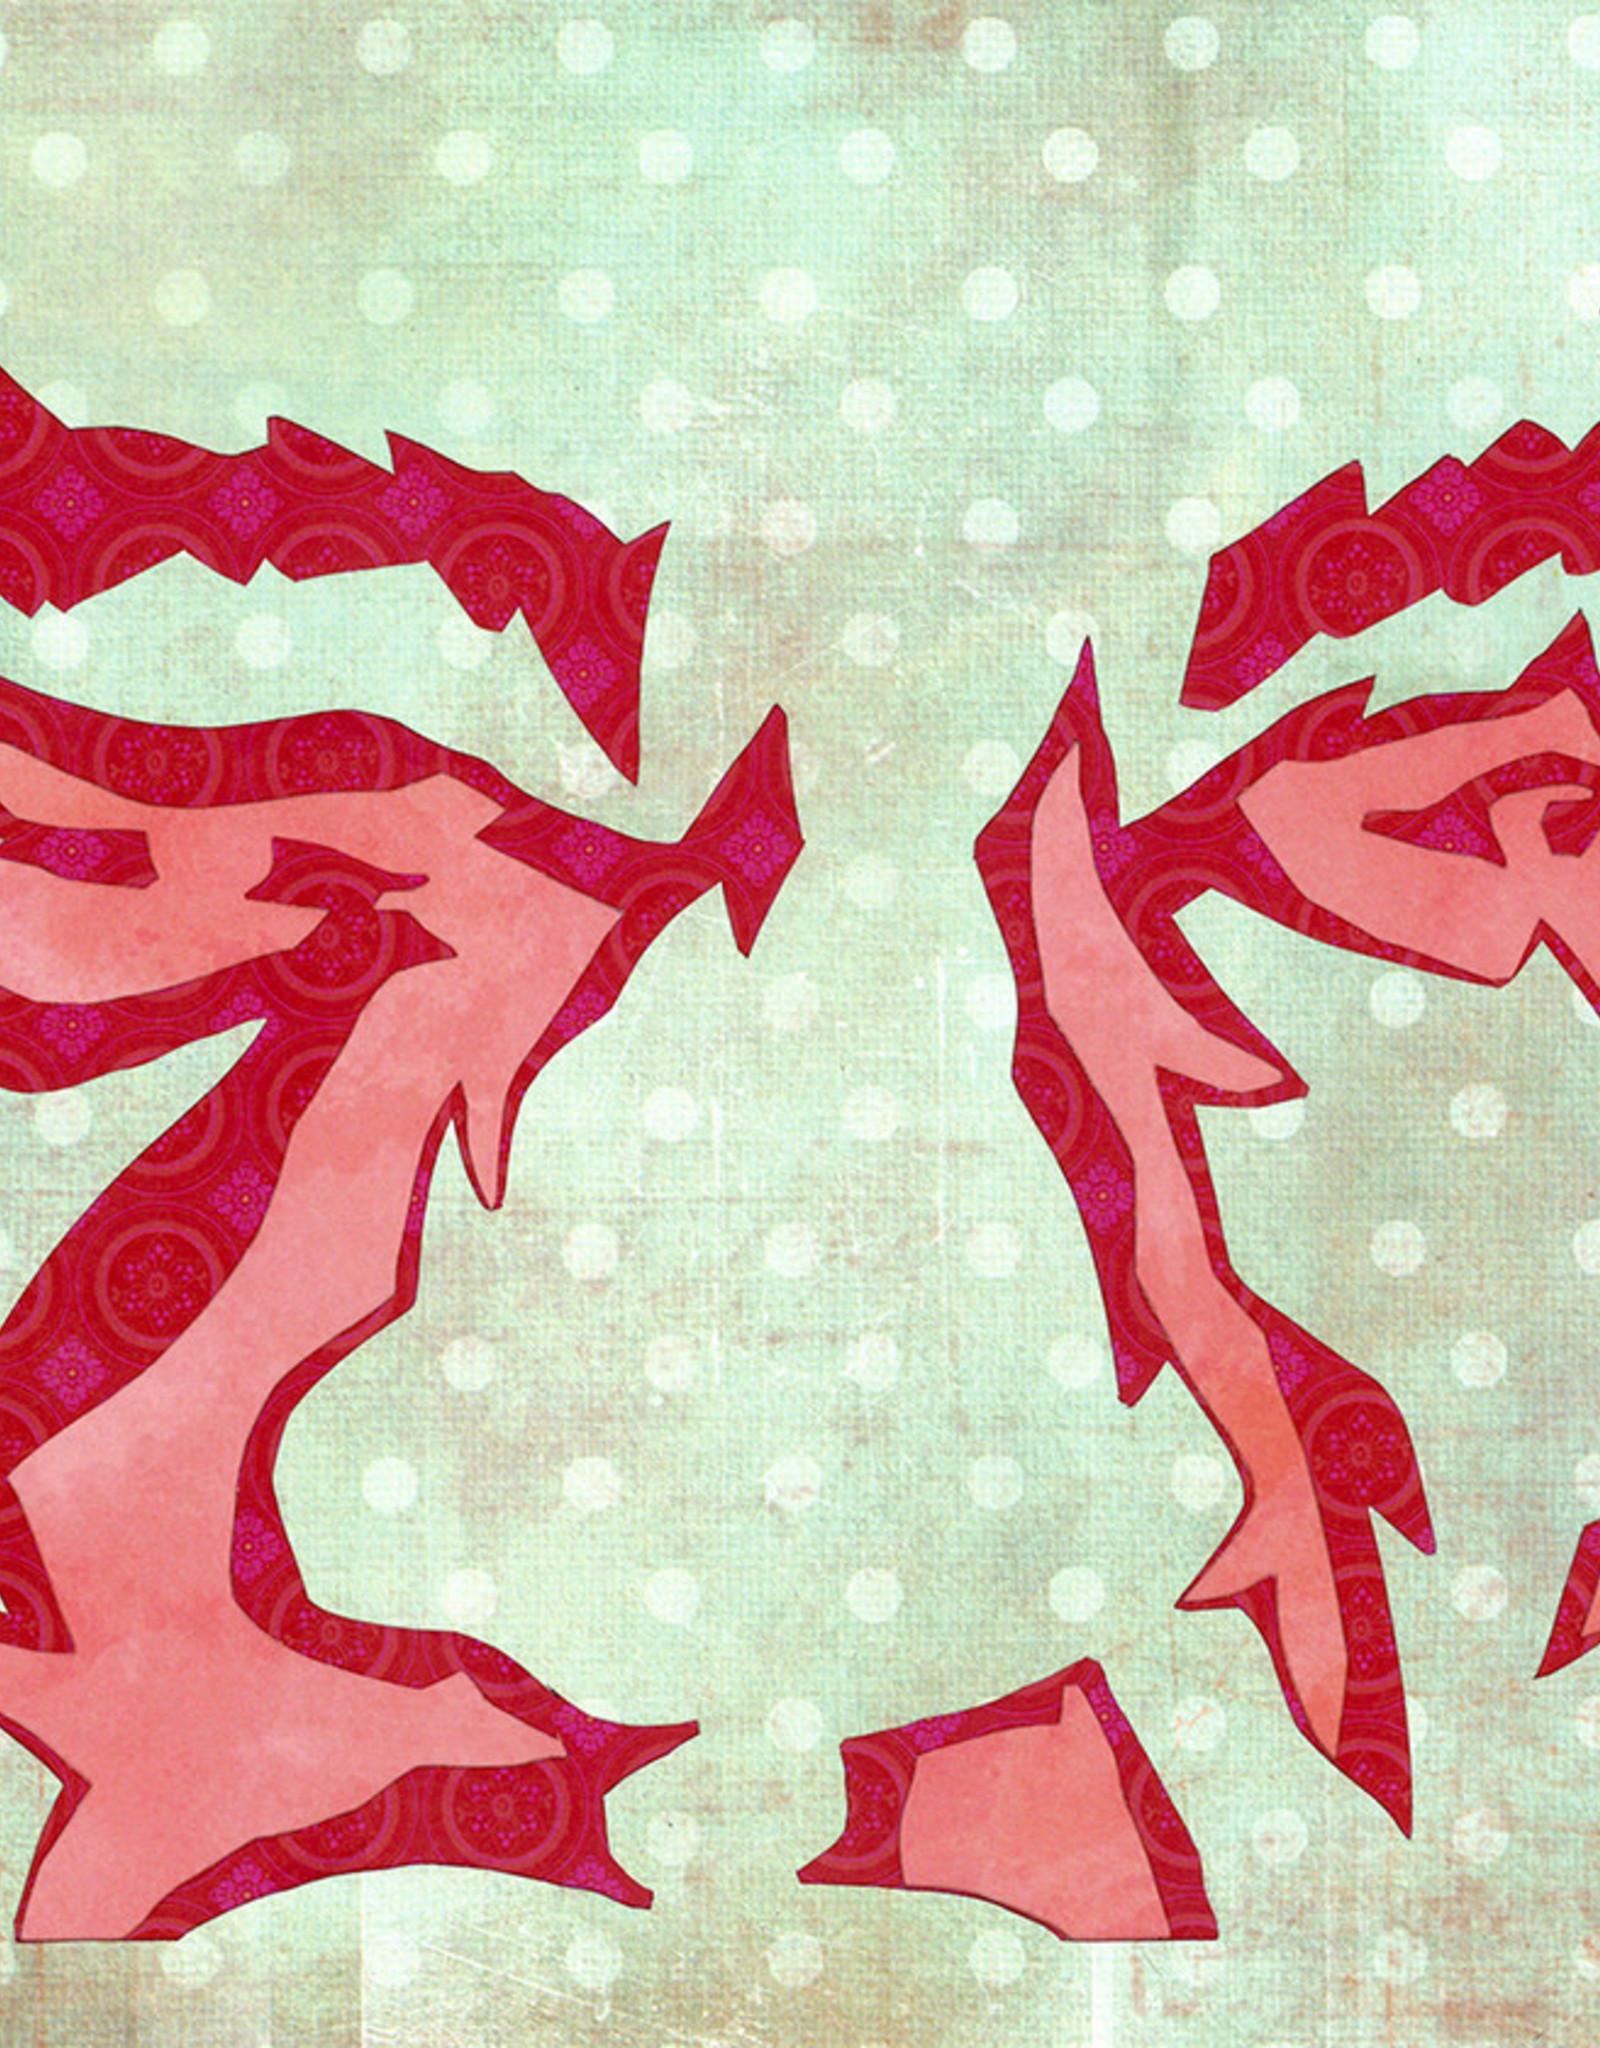 Gray Jones Face to Face -Cutout 9x12 #7